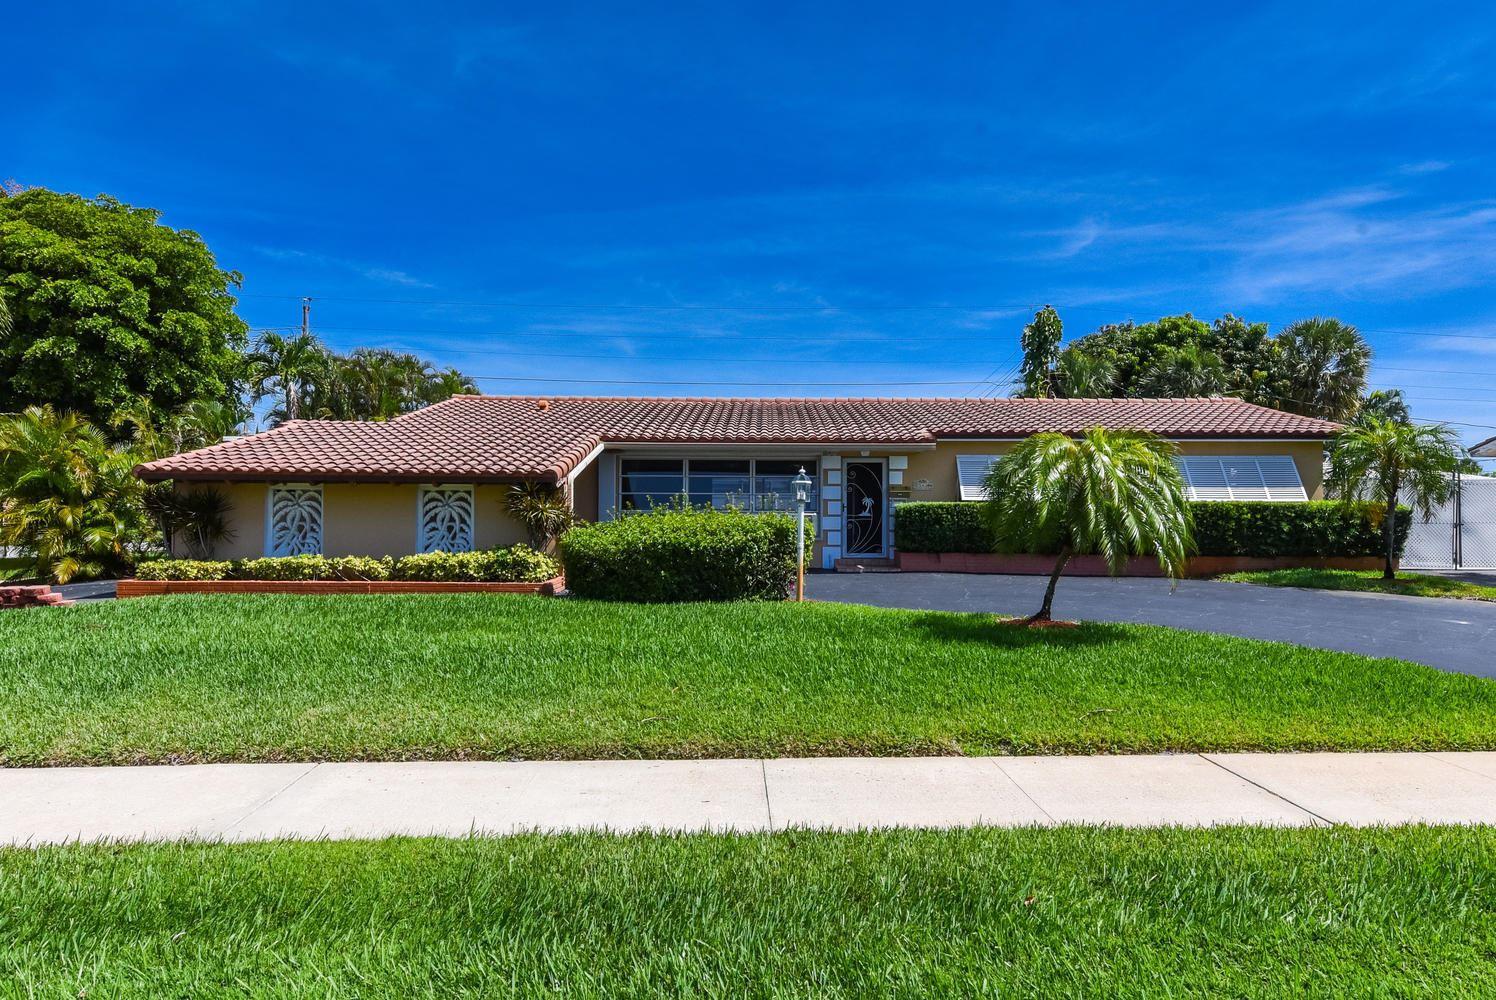 541 Kingfish Road, North Palm Beach, FL 33408 - #: RX-10621929